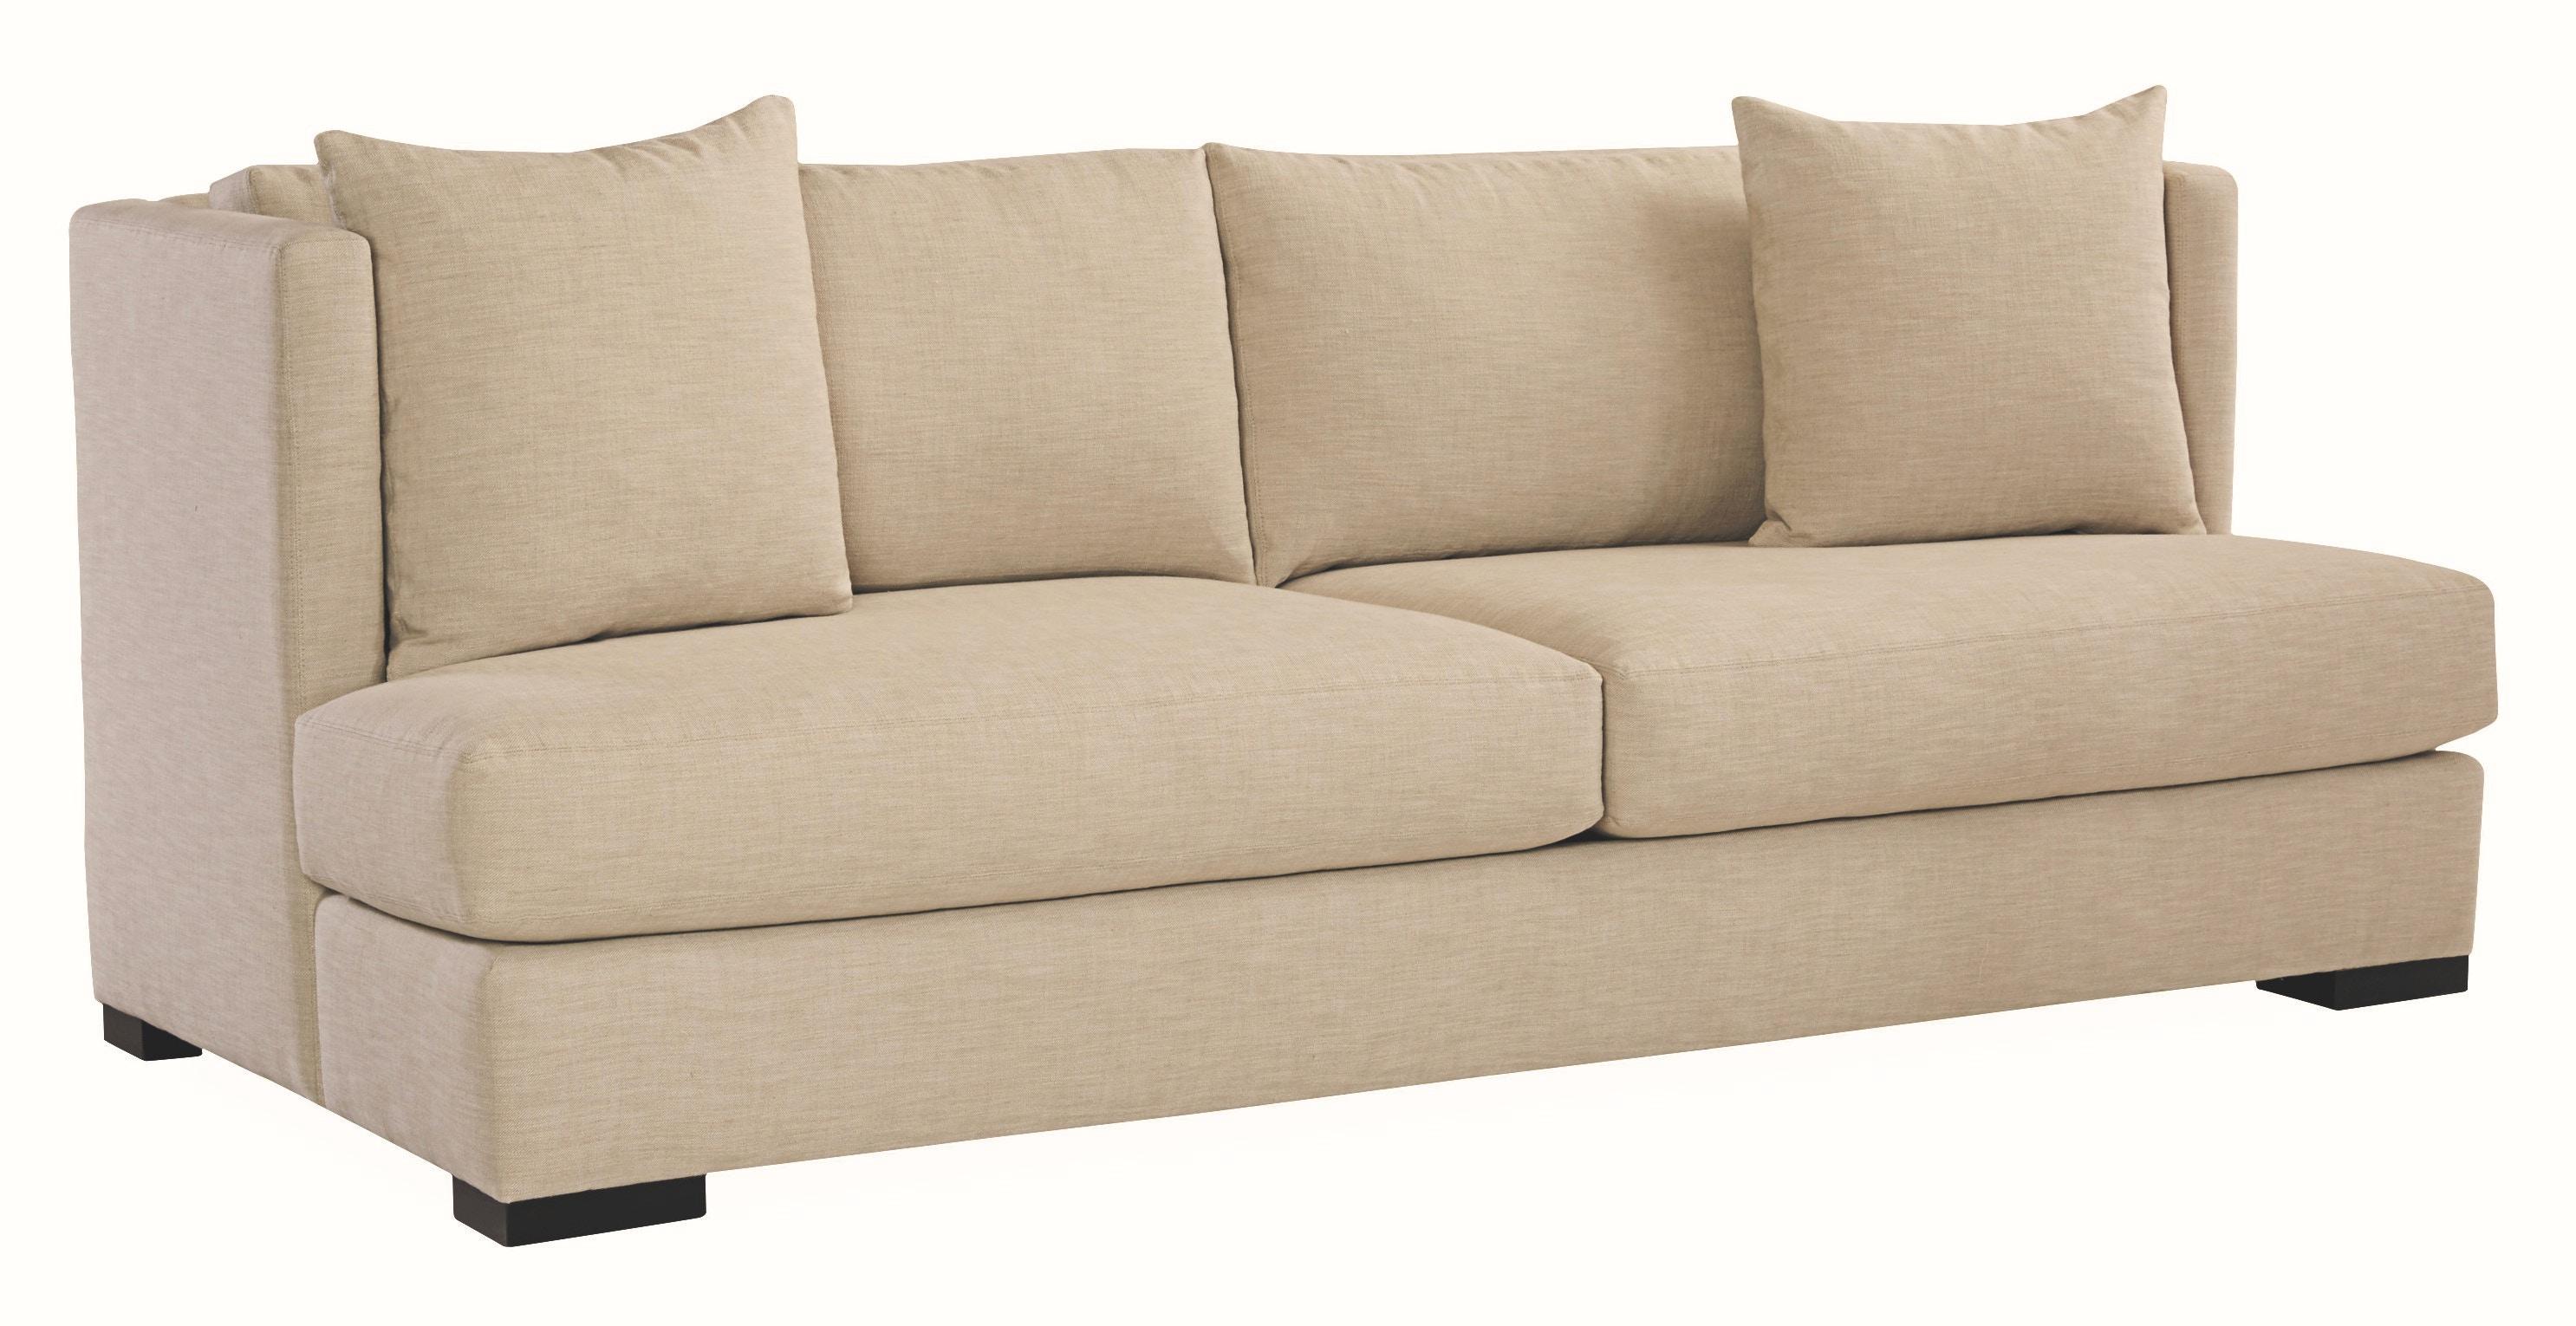 Lee Industries Living Room Sofa 7482 03 Alyson Jon Interiors